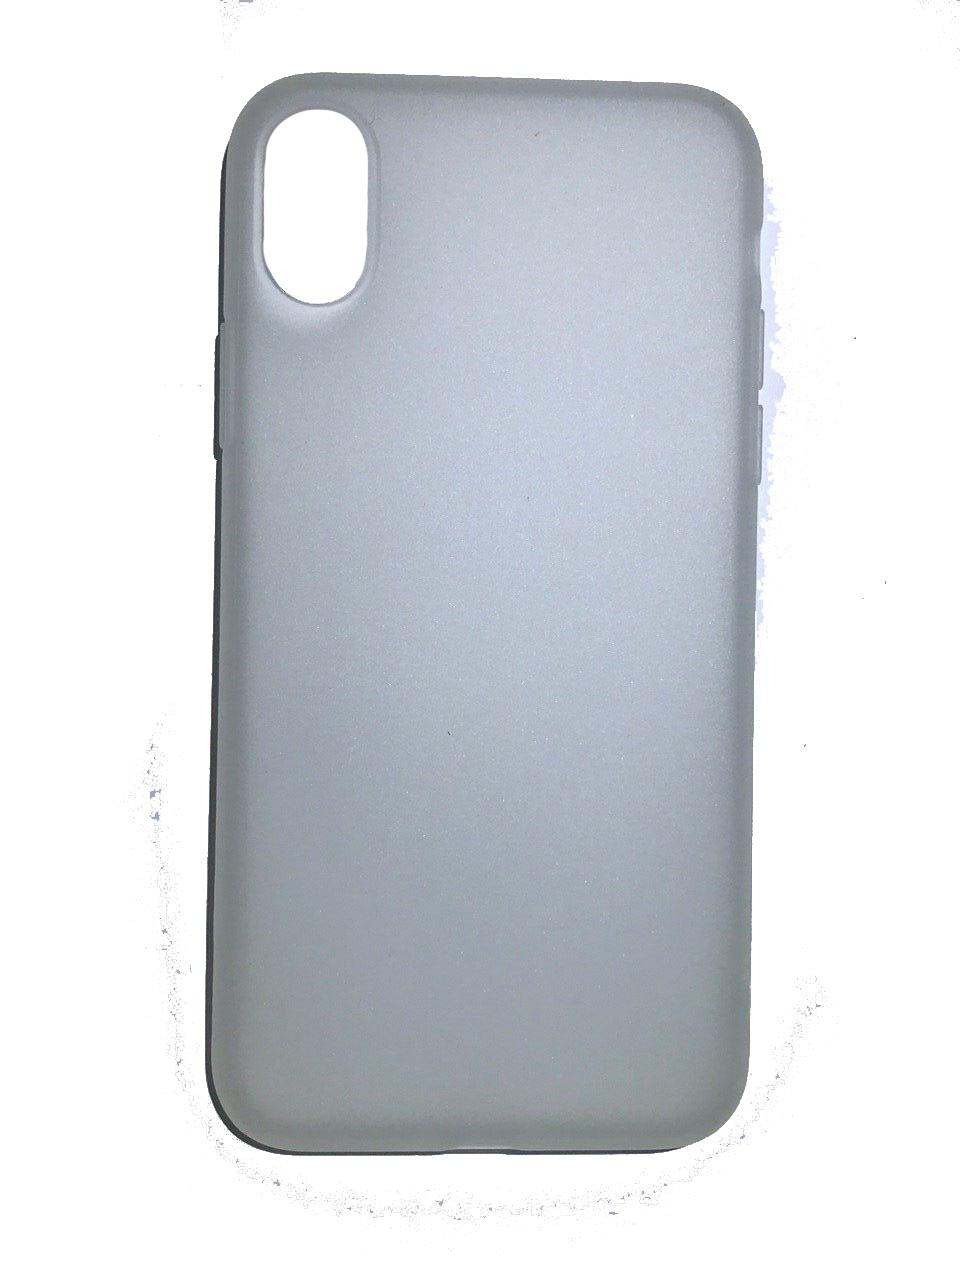 Чехол для сотового телефона Benks Чехол for iPhone X силикон (White), белый glare free screen protector with cleaning cloth for iphone 3g